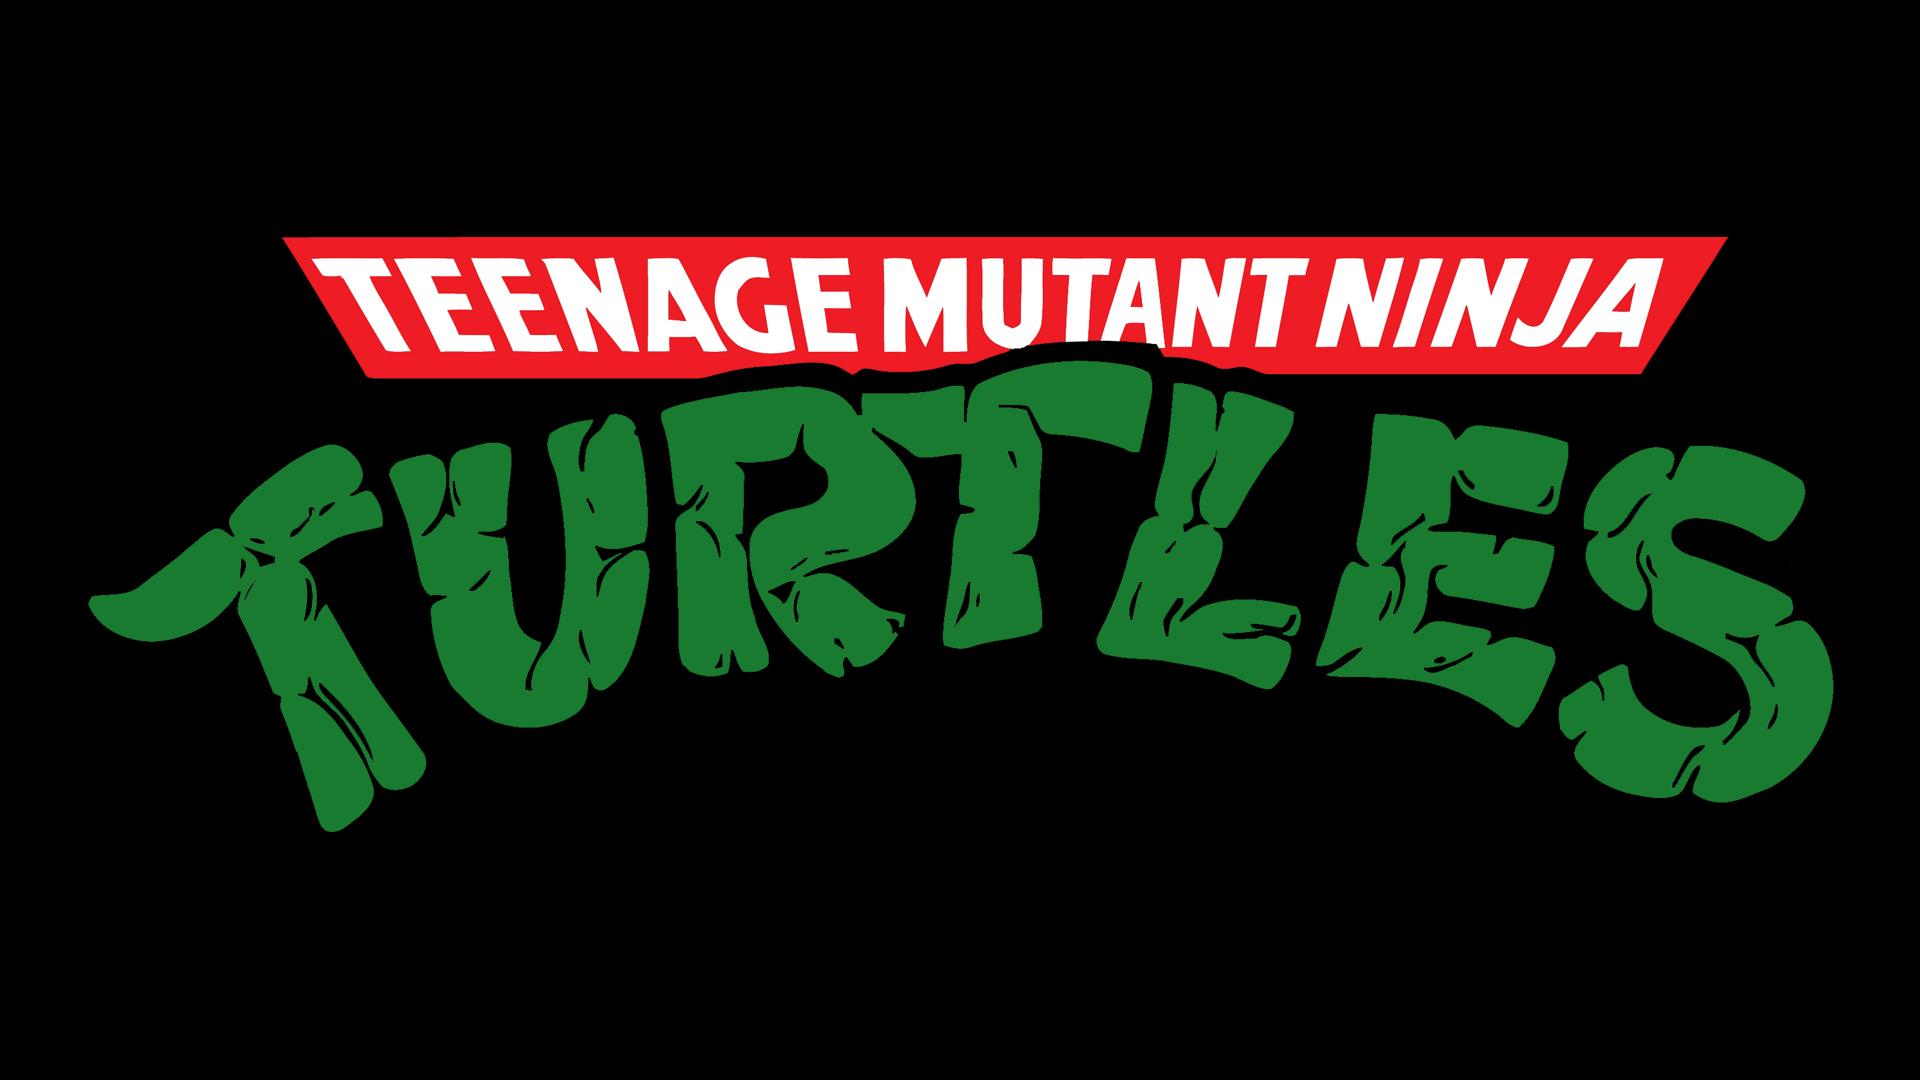 Free Download Ninja Turtles Wallpaper For Desktop Wallpaper